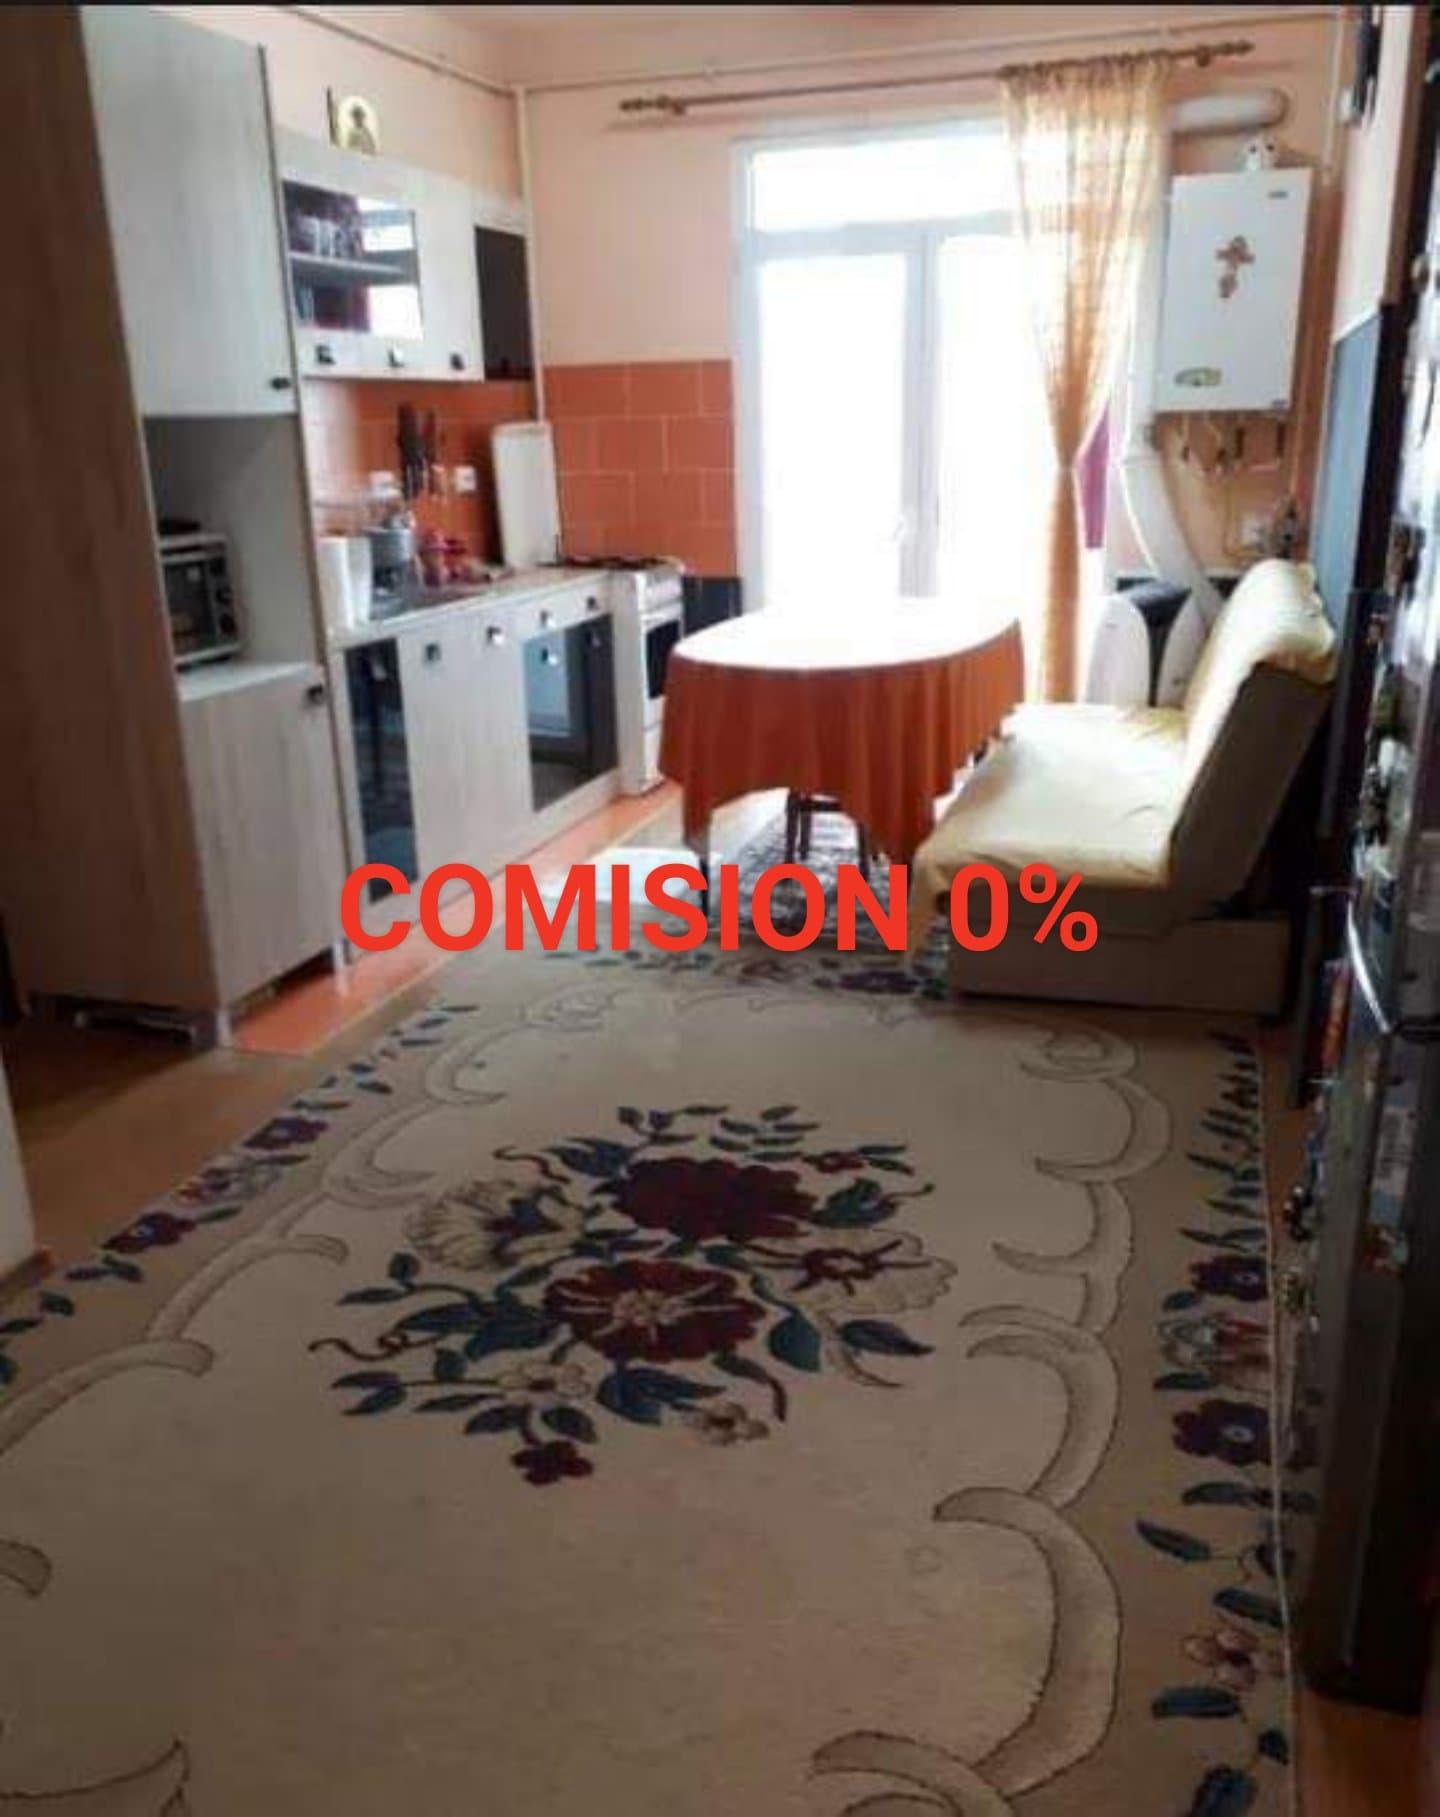 183601-Vanzare apartament 2 camere, Iris, Cluj-Napoca